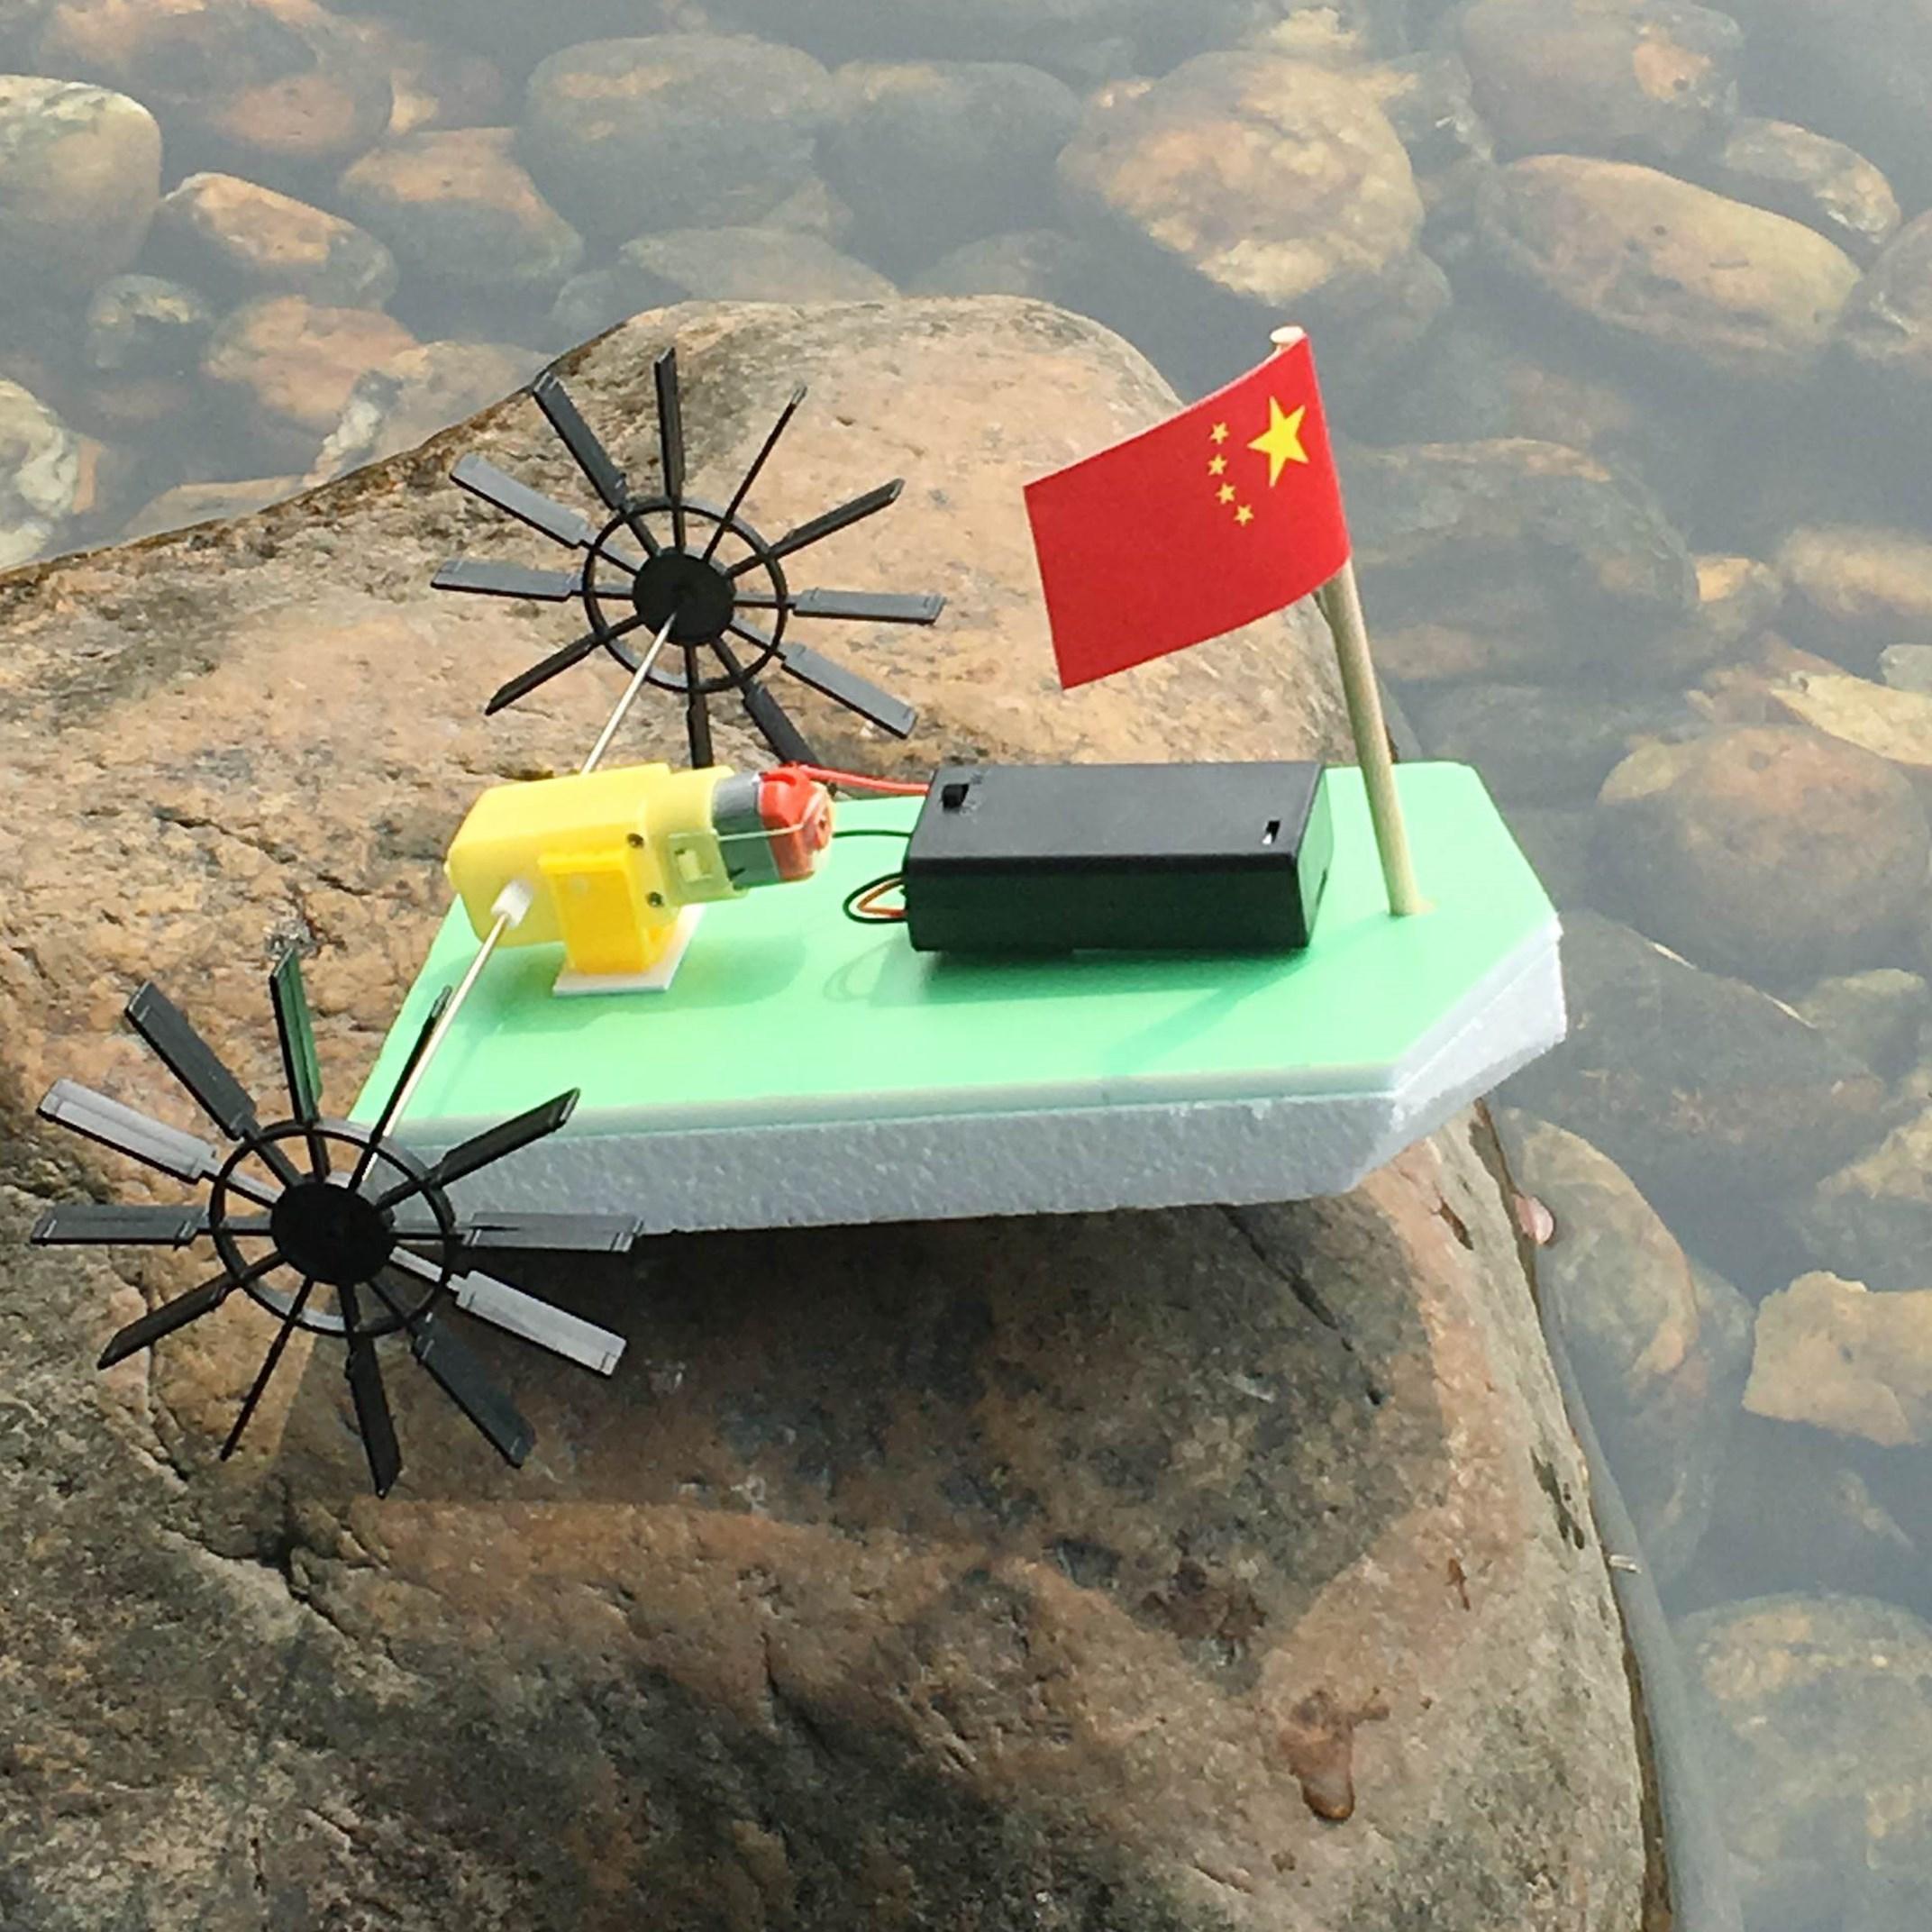 diy双桨明轮船 电动快艇益智科技365bet网上娱乐_365bet y亚洲_365bet体育在线导航小制作轮船模型